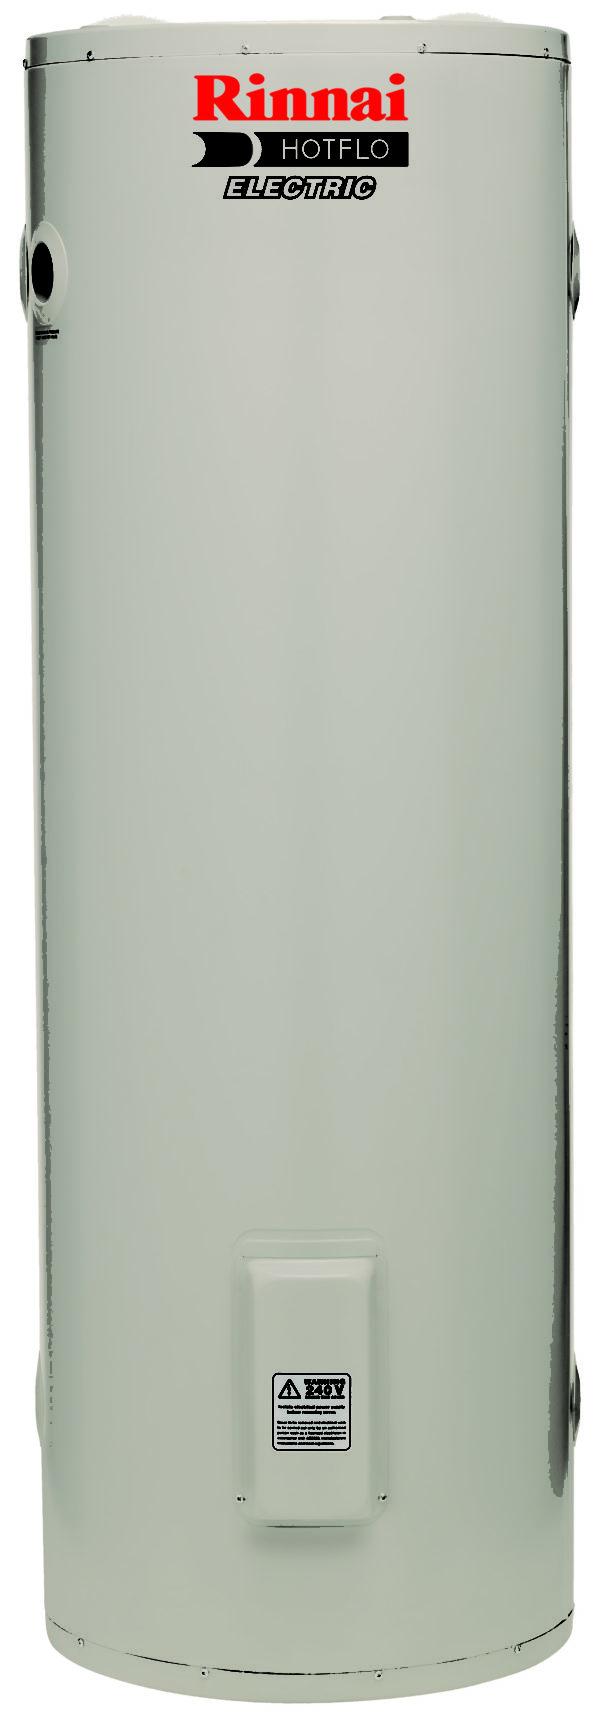 160L Rinnai Electric Hotflo heater